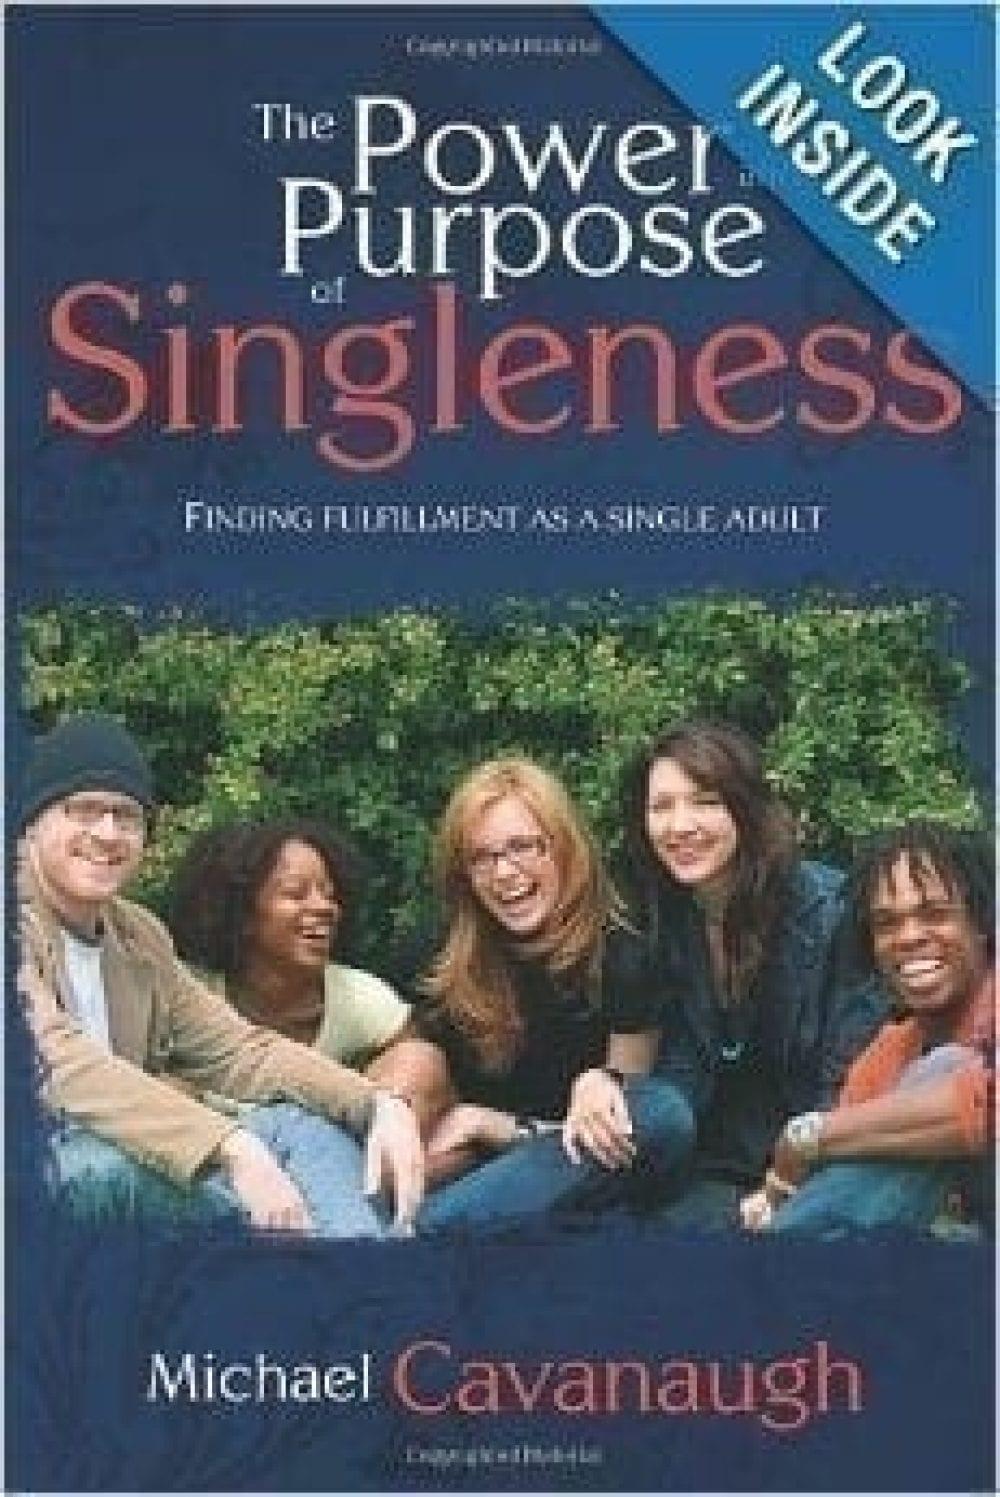 Power and Purpose of Singleness